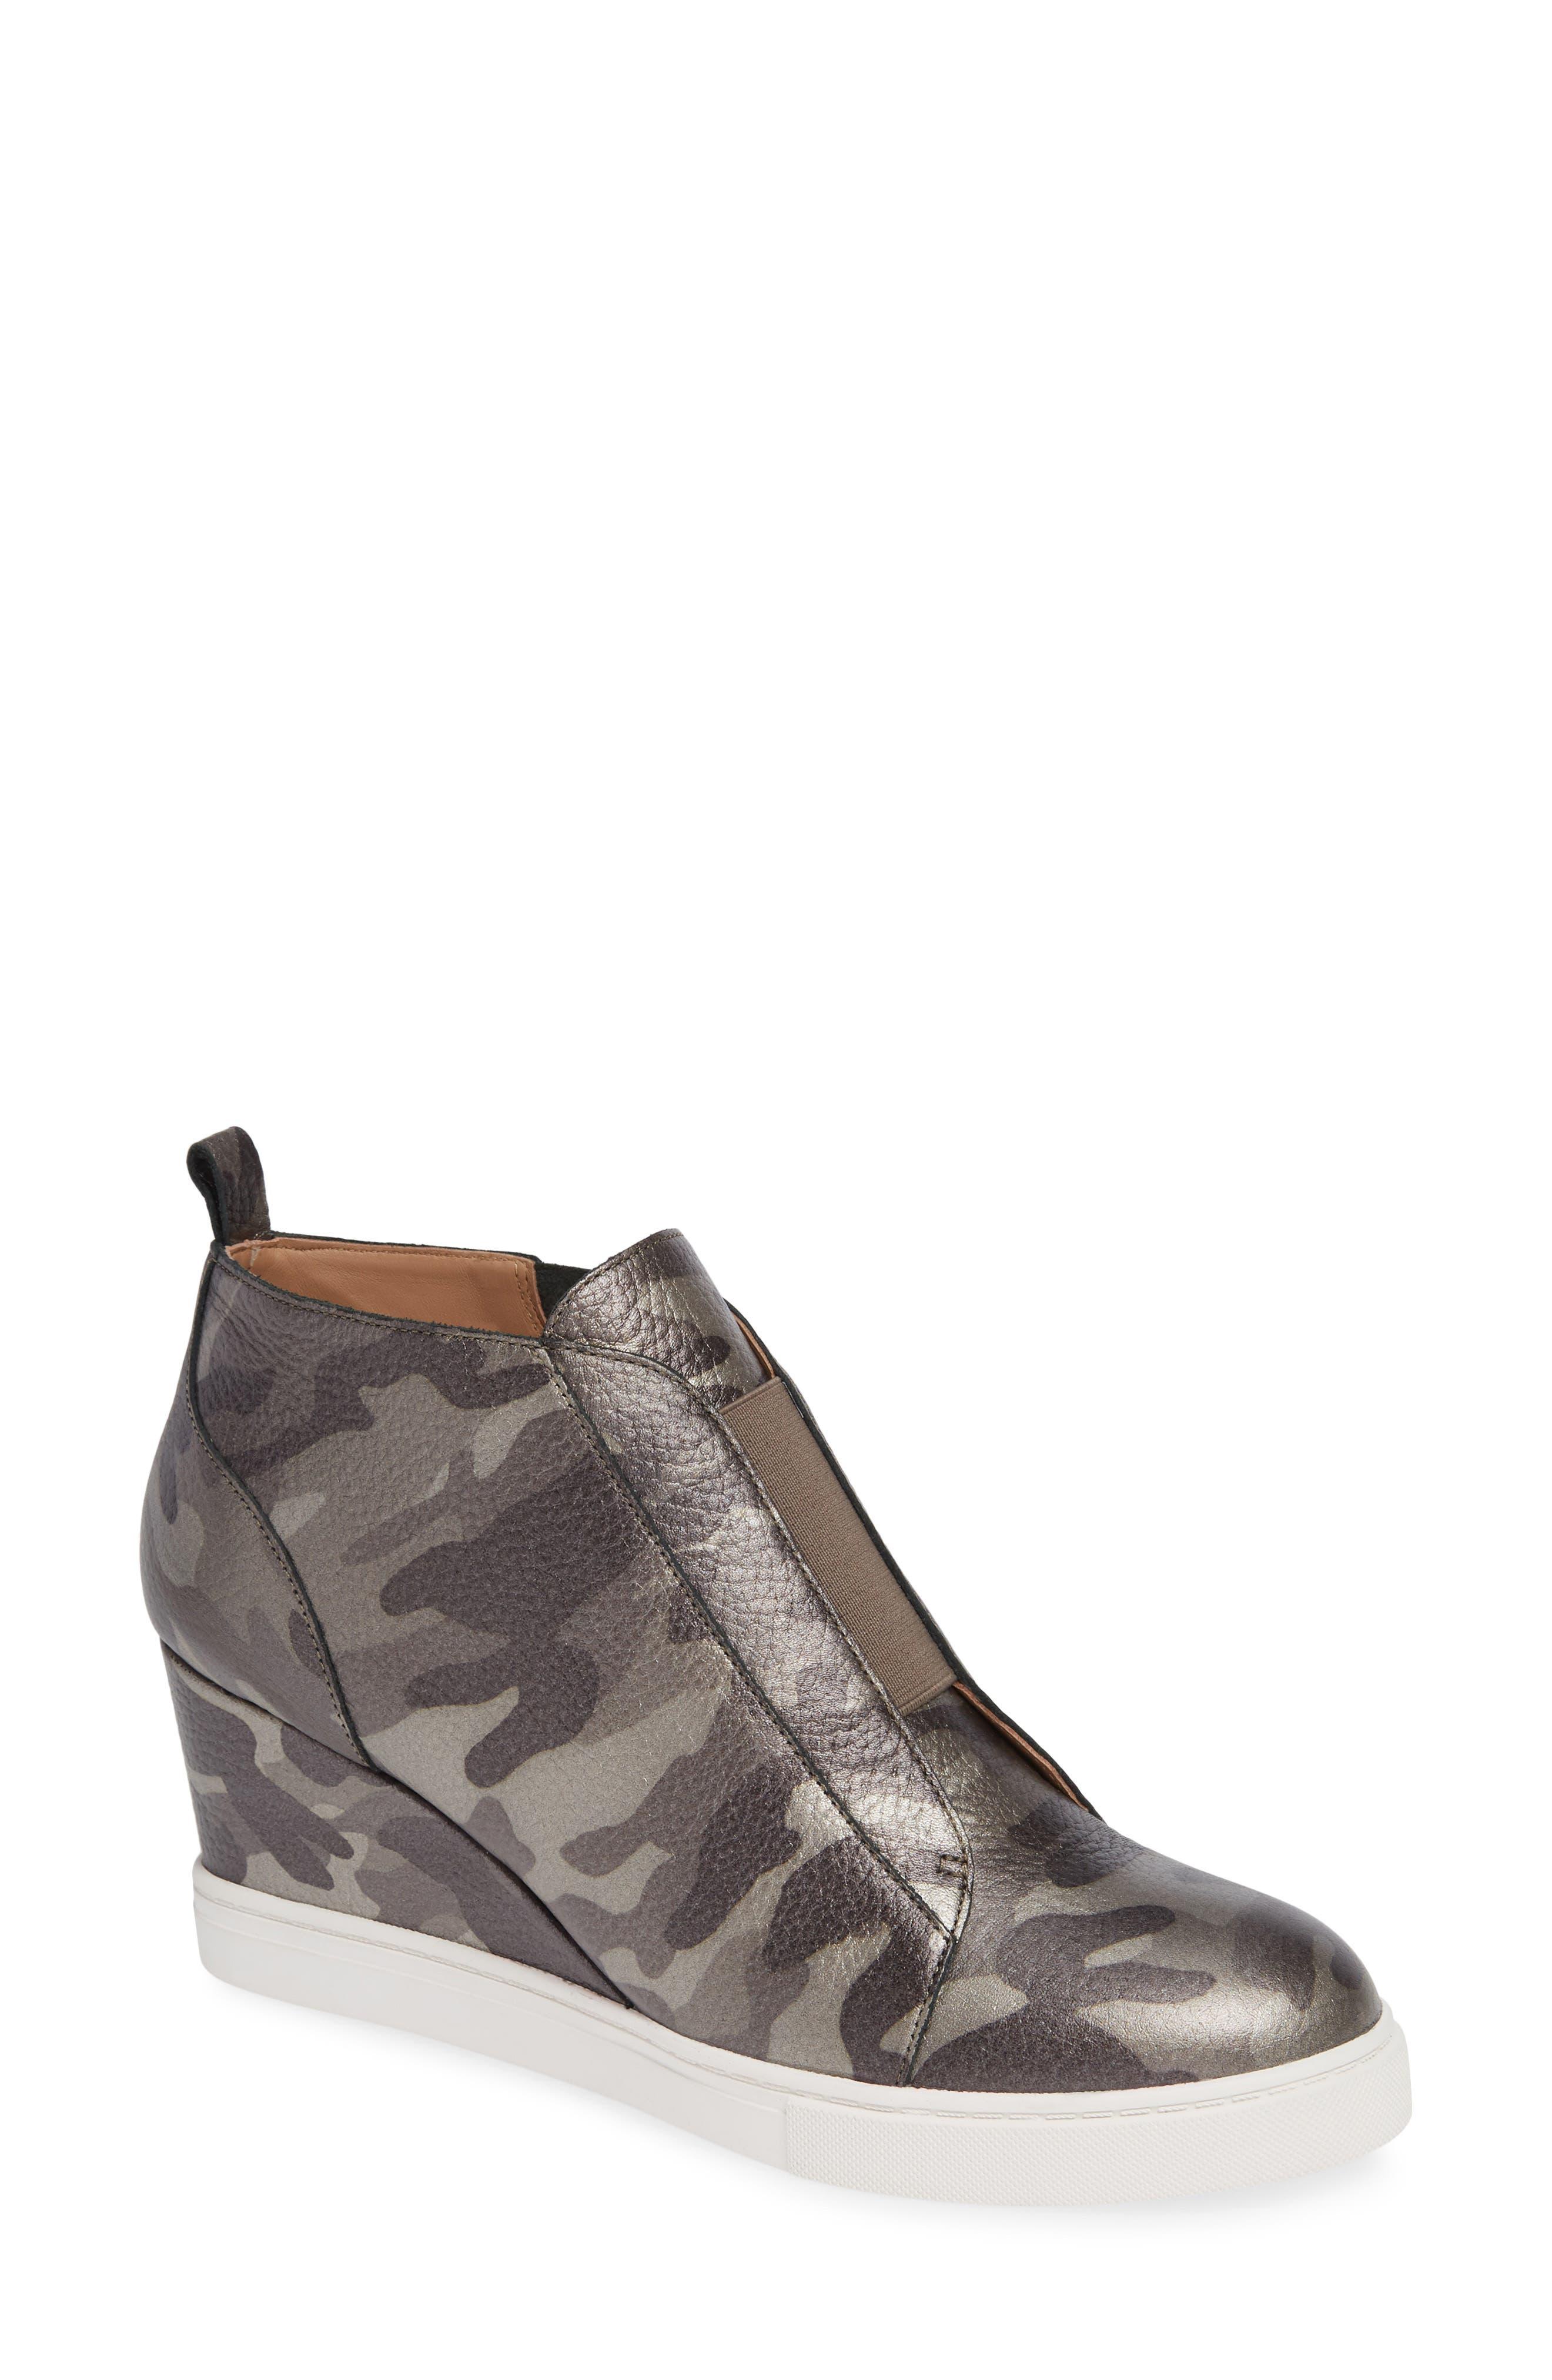 'Felicia' Wedge Bootie,                         Main,                         color, Dark Grey Print Leather